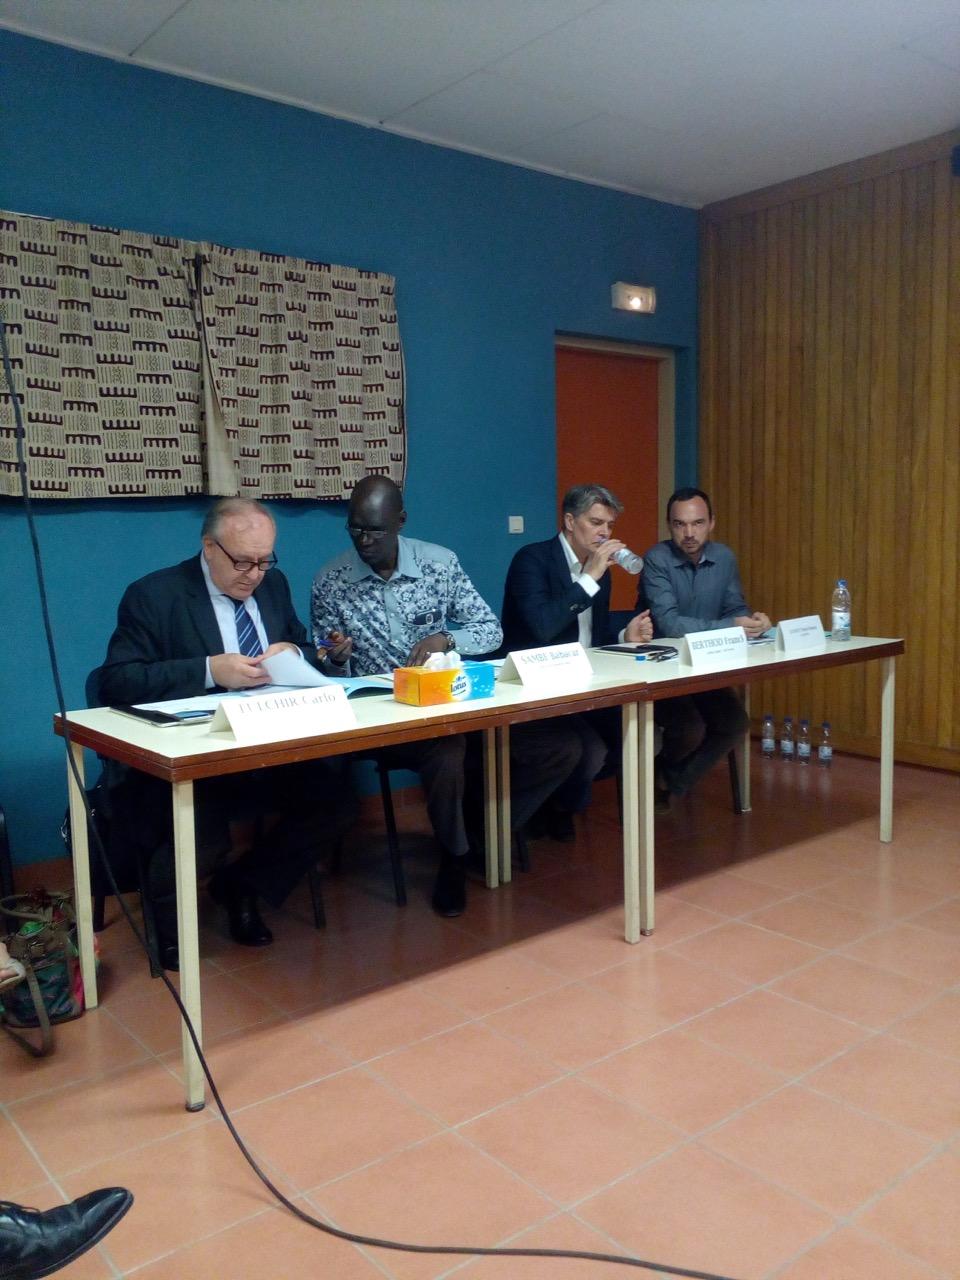 Business_Model_Competition_Jury_Abidjan.jpeg